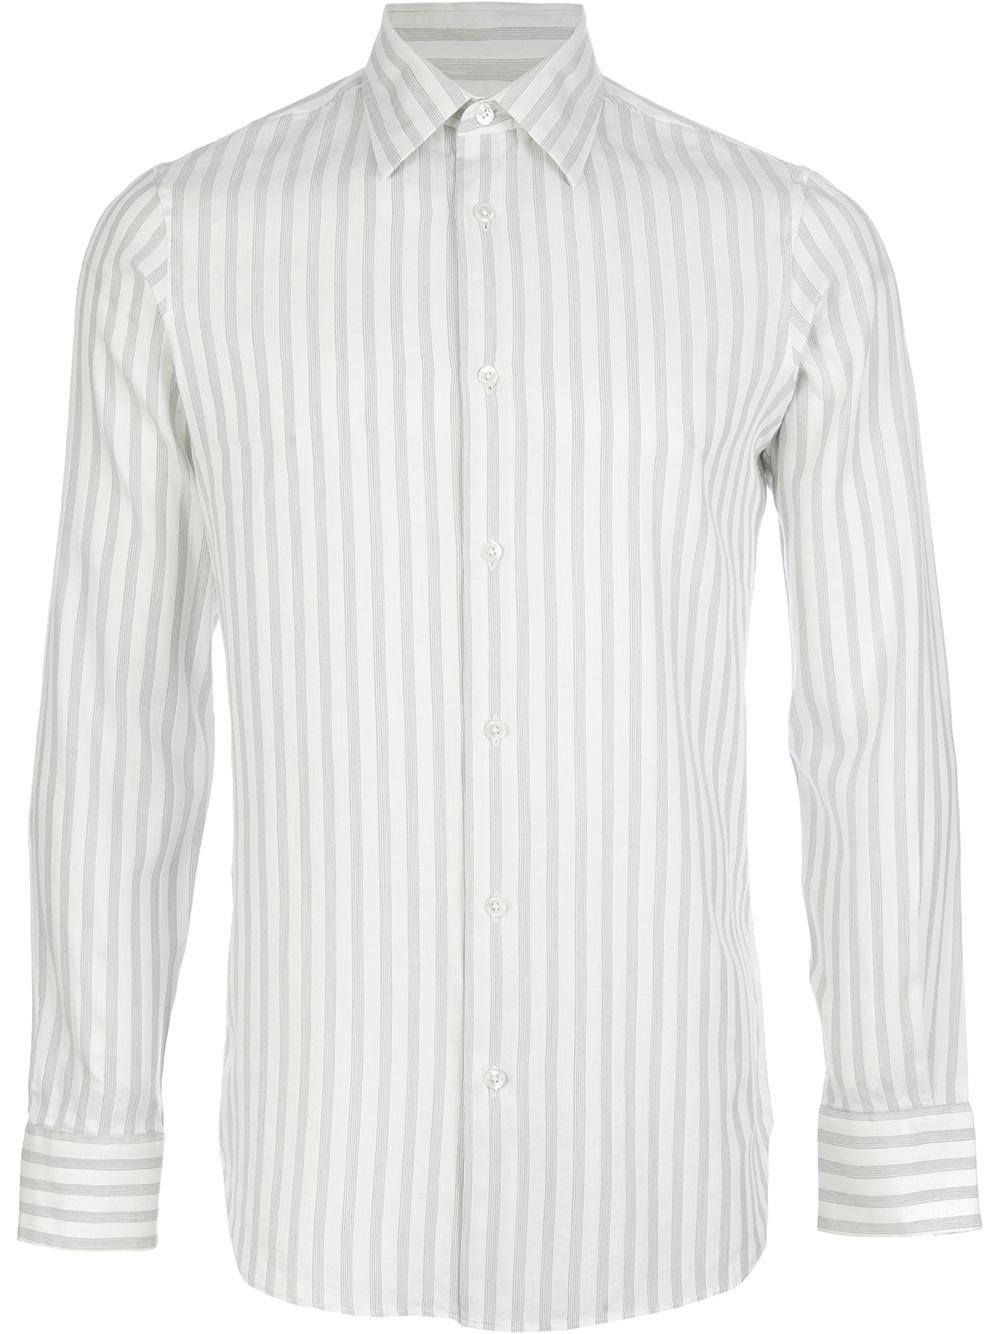 Ann demeulemeester grise Striped Shirt in White for Men | Lyst